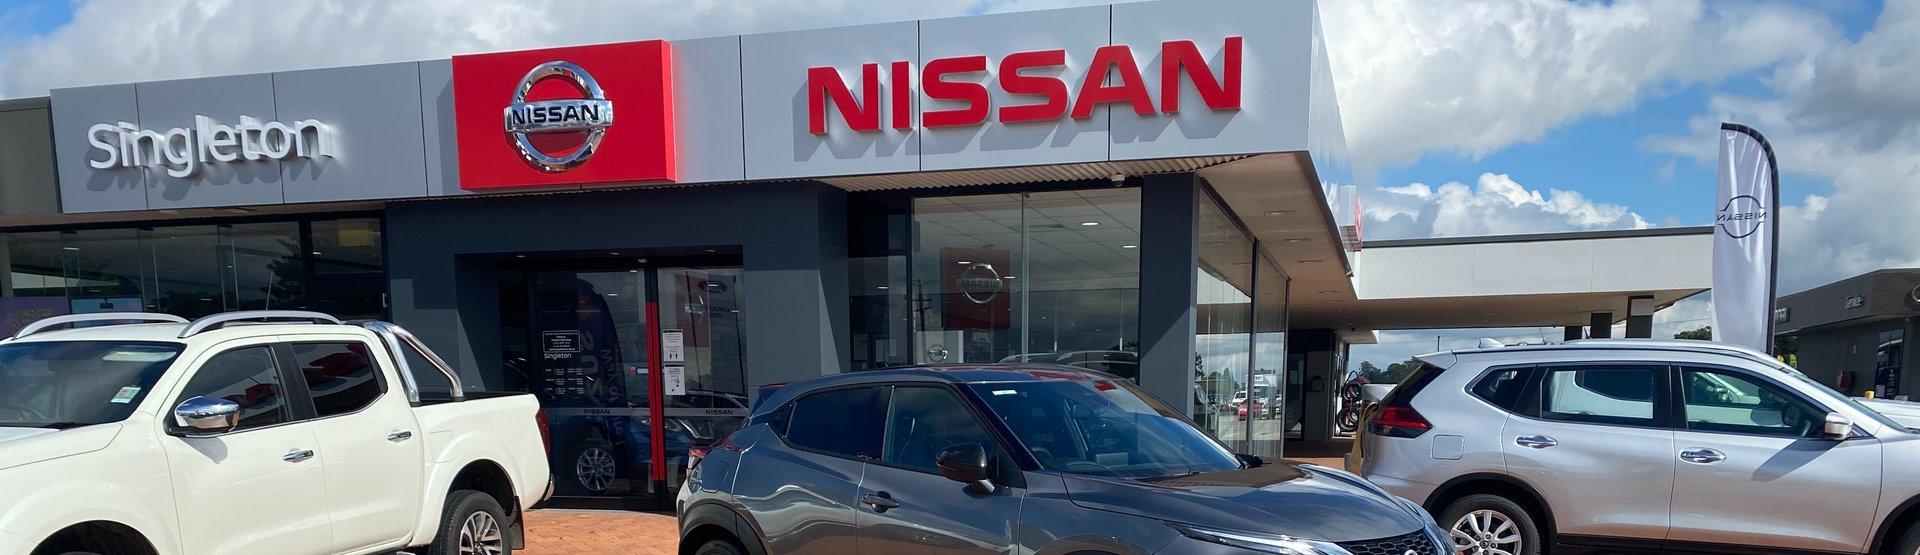 Singleton Nissan